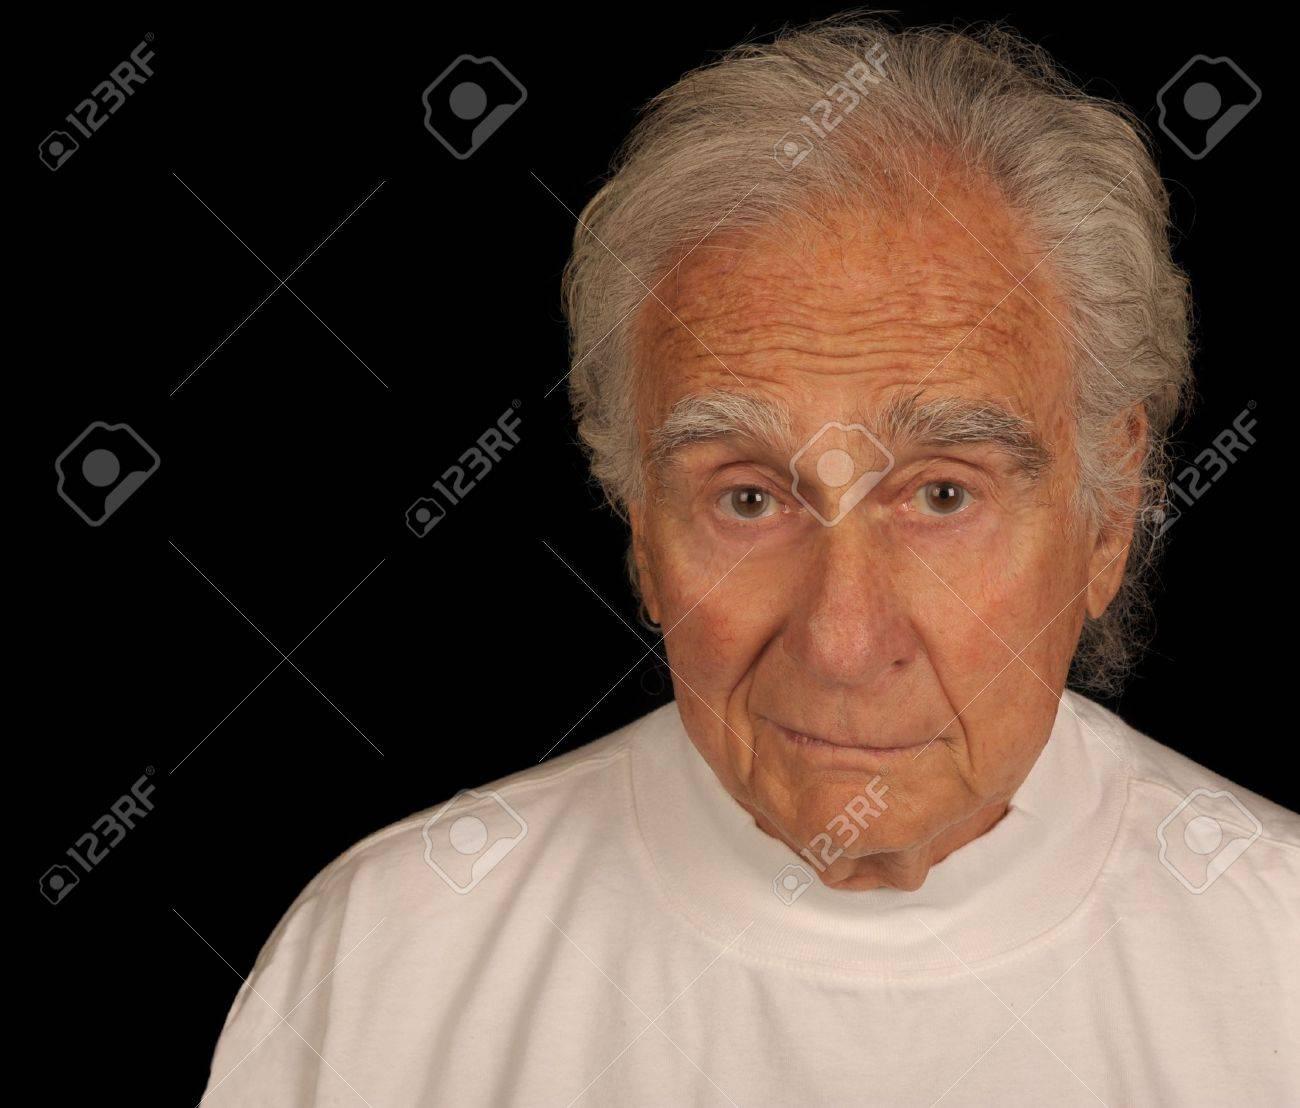 Very Nice Image Of a Elderly man on Black Stock Photo - 10950872